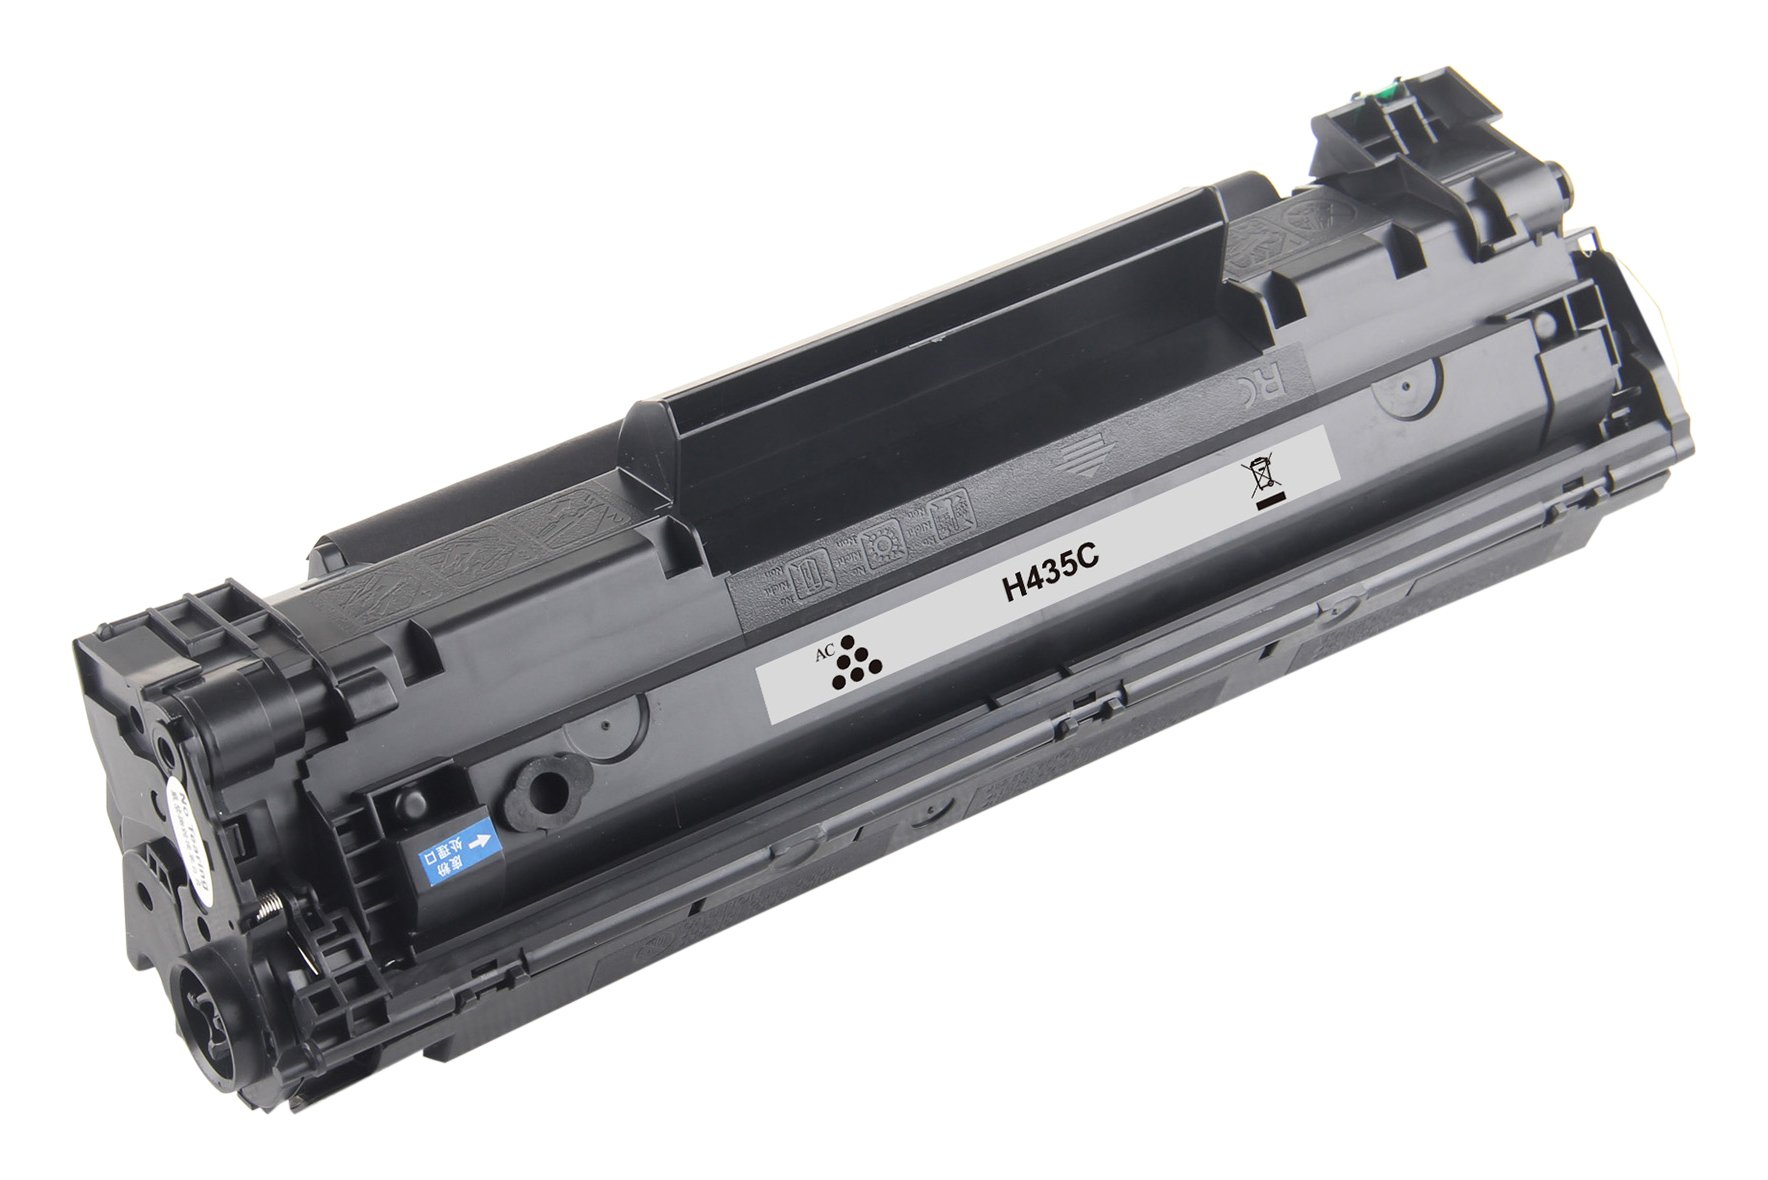 Hewlett Packard CB435A用アルパカートリッジCB435Aレーザーカートリッジ - ブラック